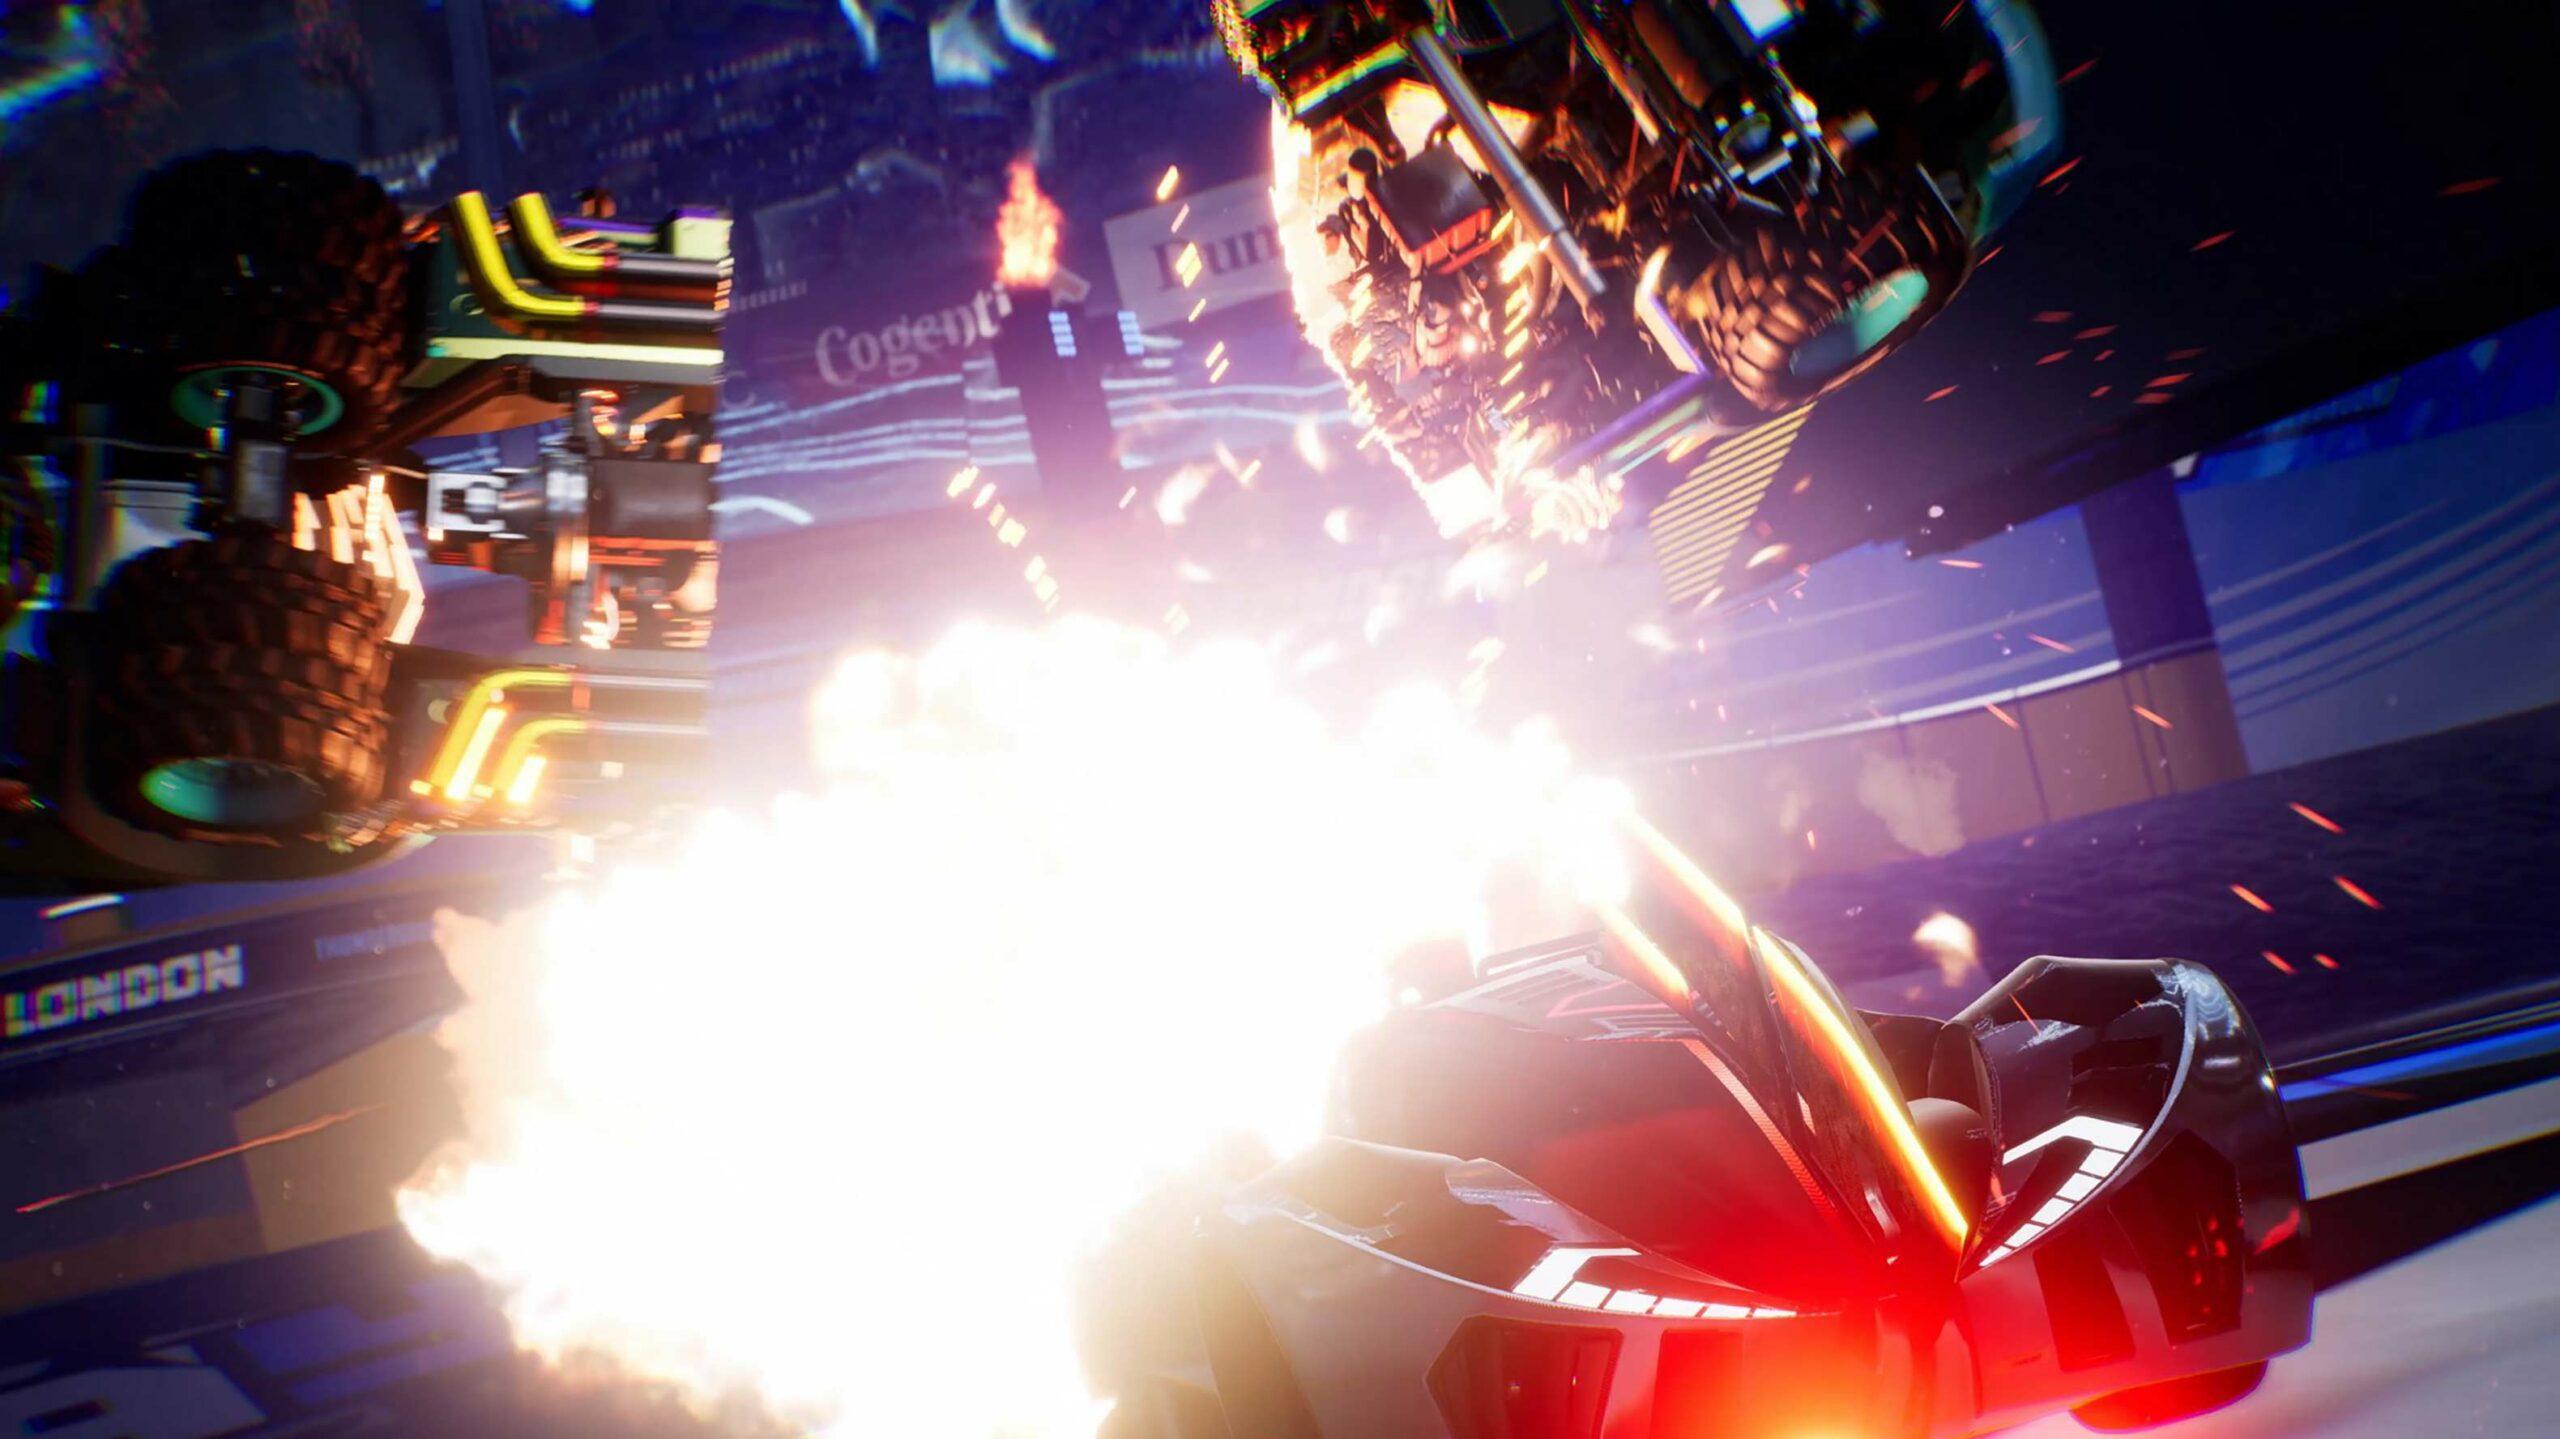 Games to 'Stream n' Load' on Google Stadia, PlayStation and Xbox [Feb. 1-7] - TechnoCodex